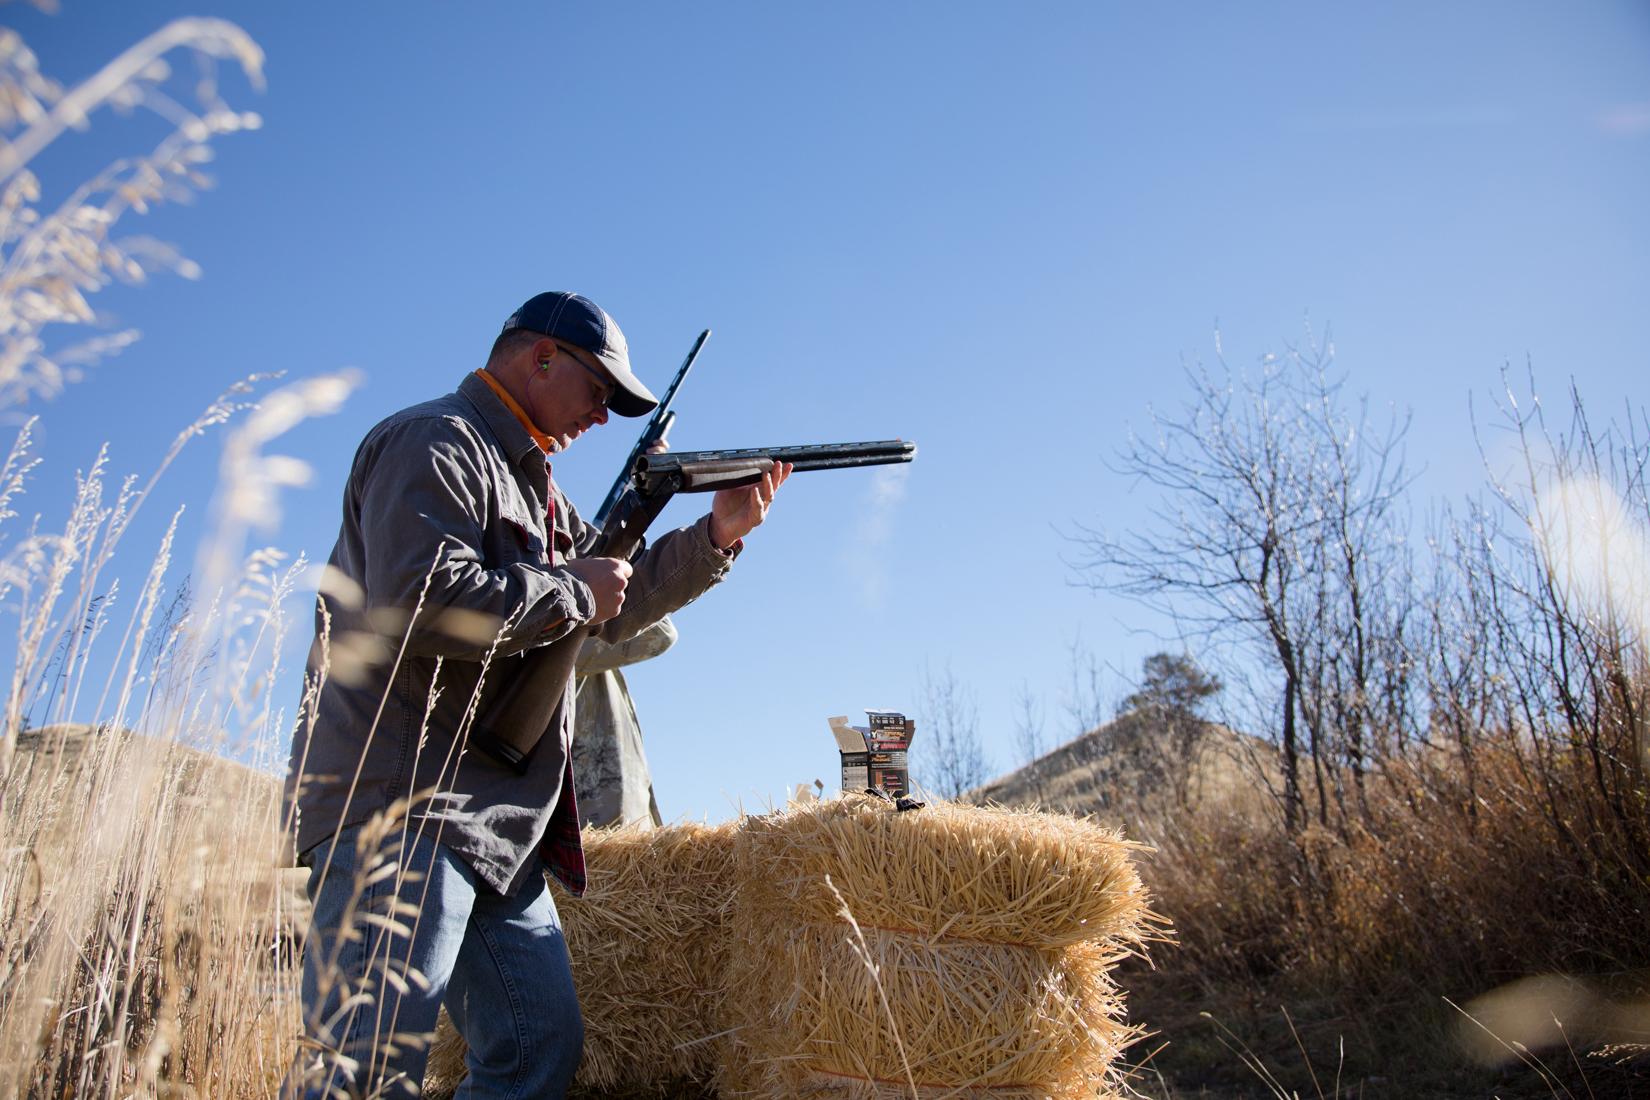 Reload for bird hunt